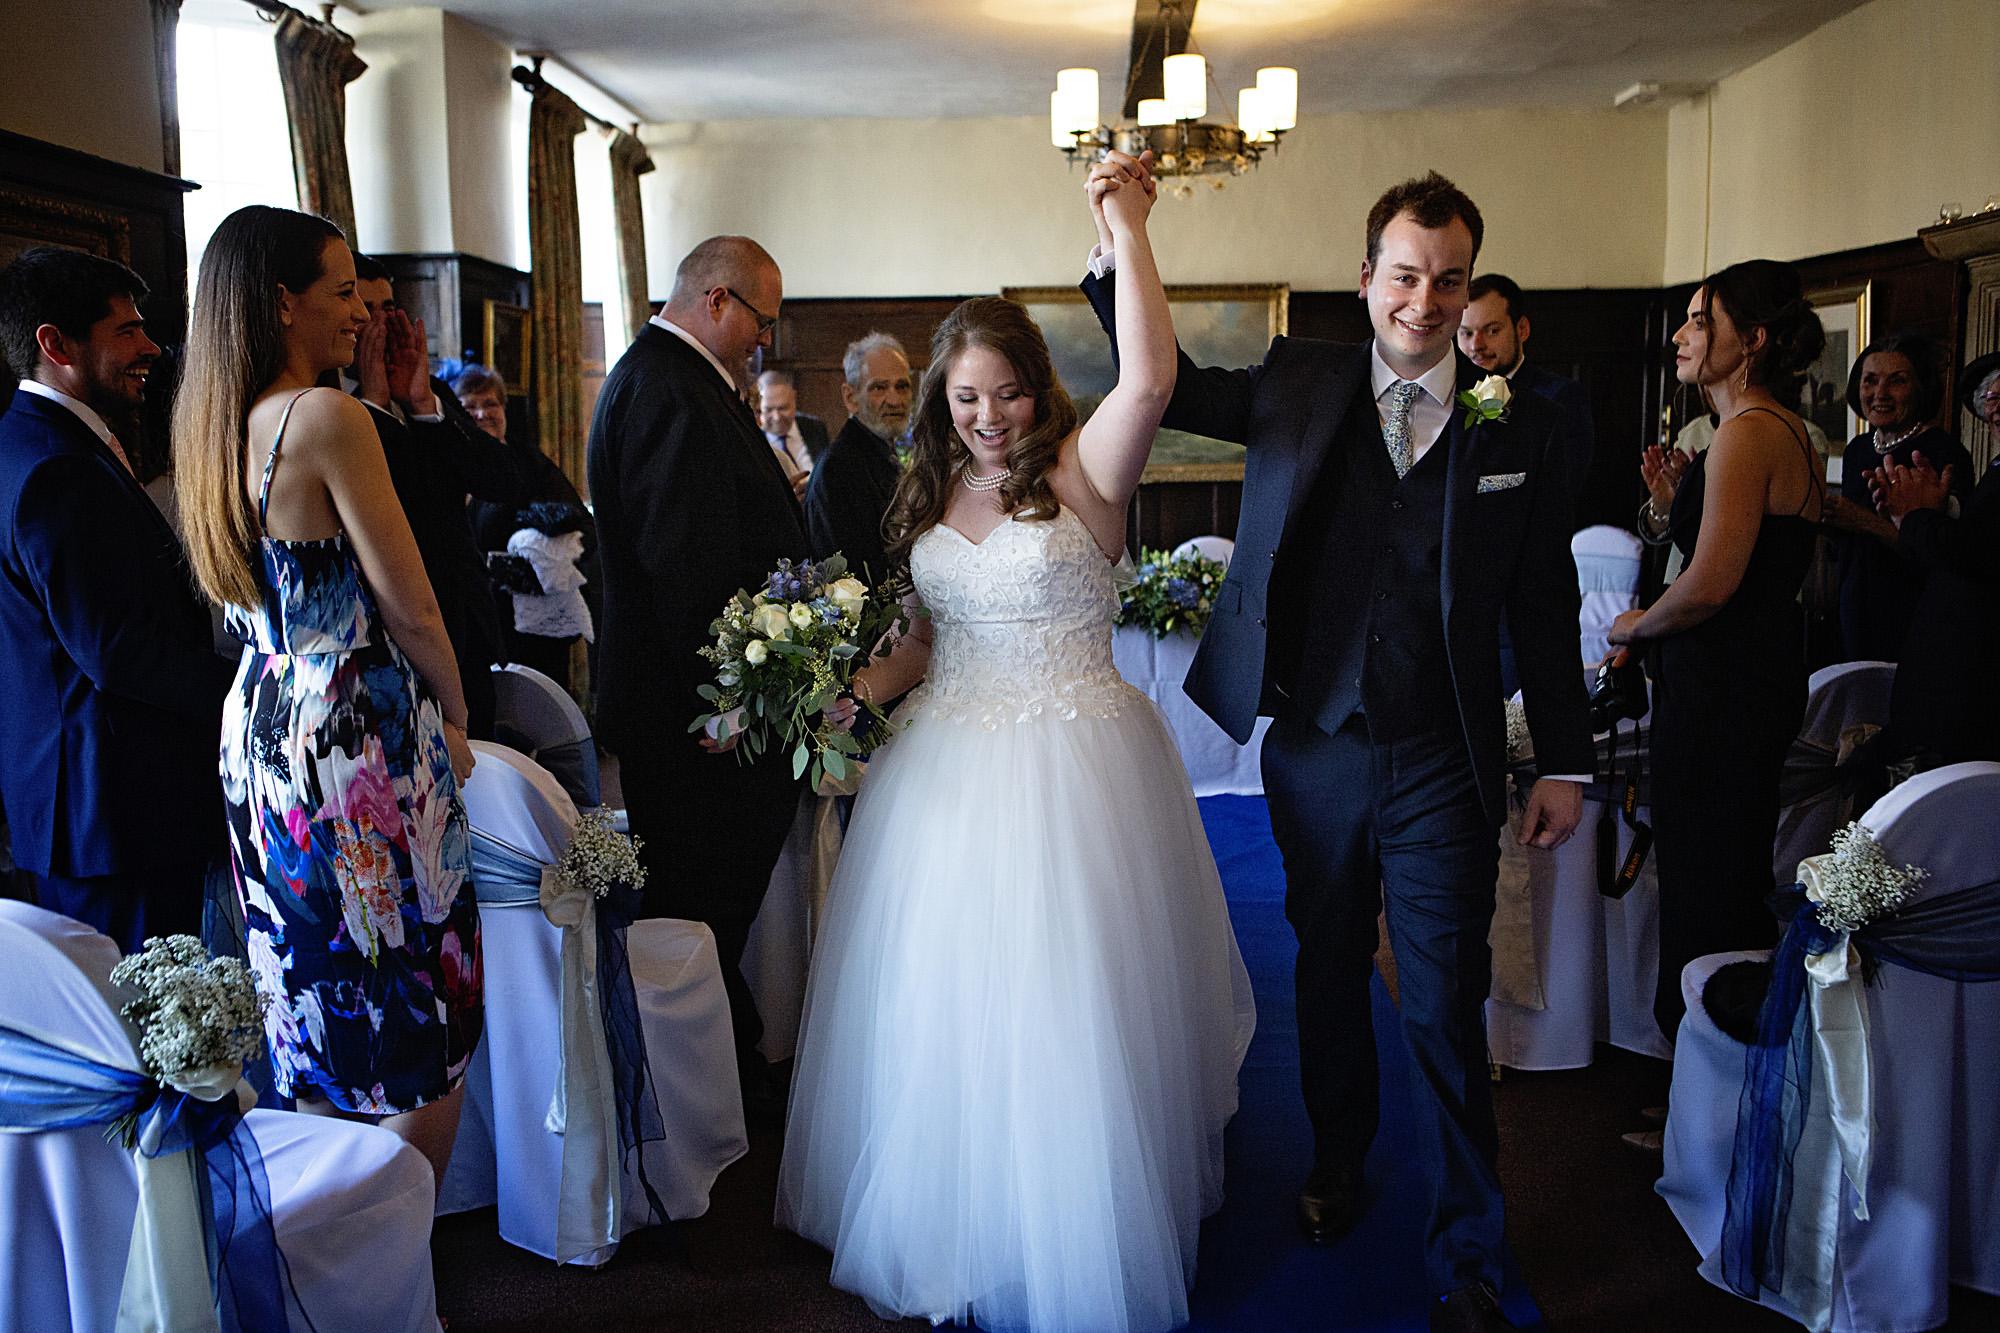 wedding-photos-talbot-hotel-oundle (22).jpg